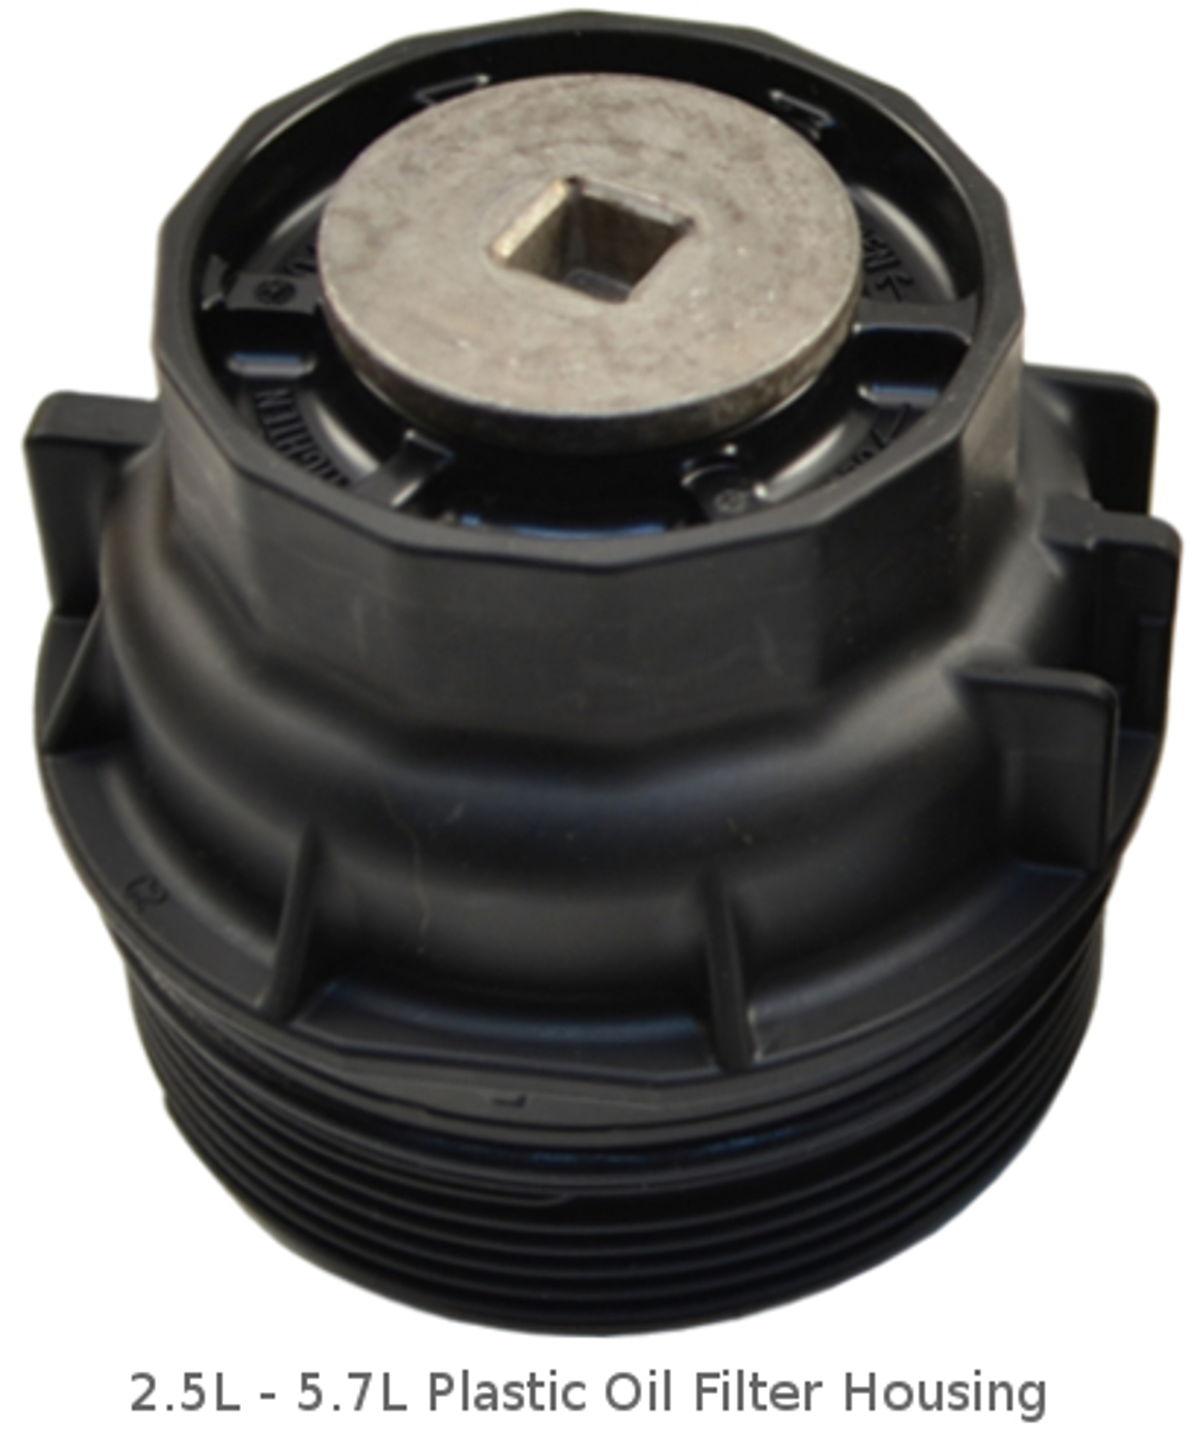 hight resolution of 2 5l 5 7l toyota plastic oil filter housing